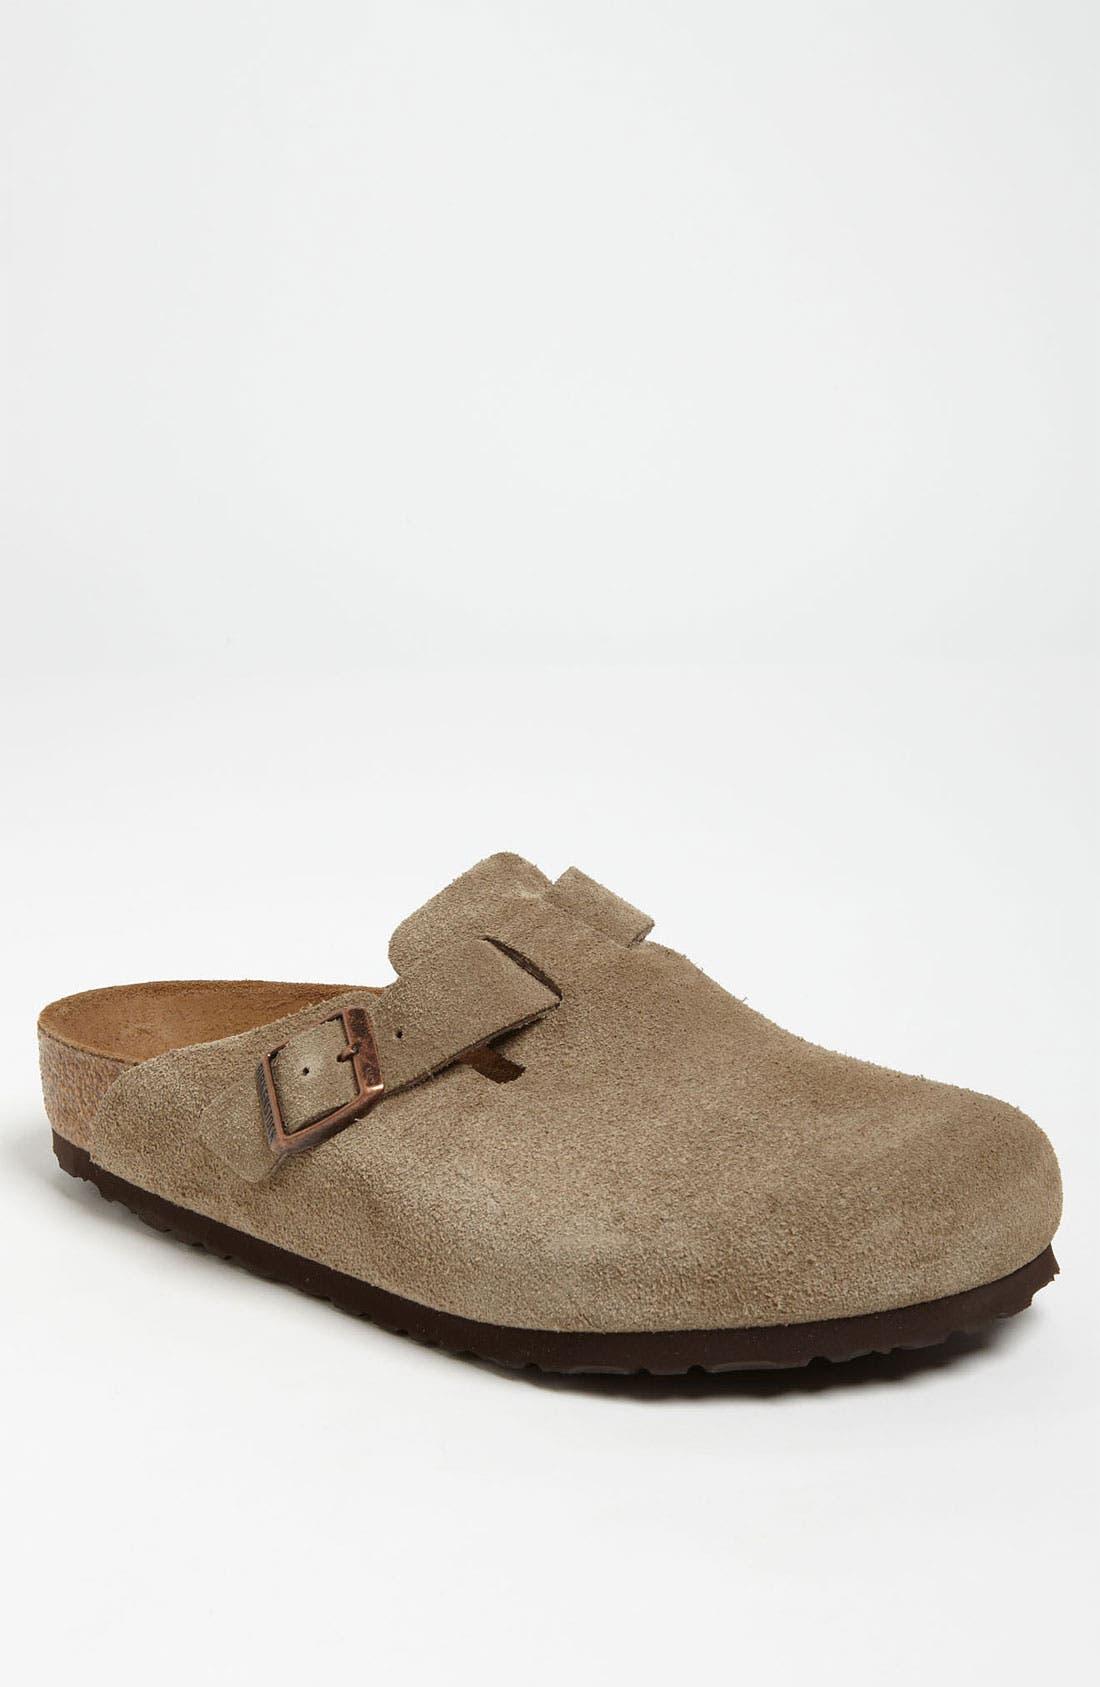 Birkenstock 'Boston Soft' Clog   (Men)